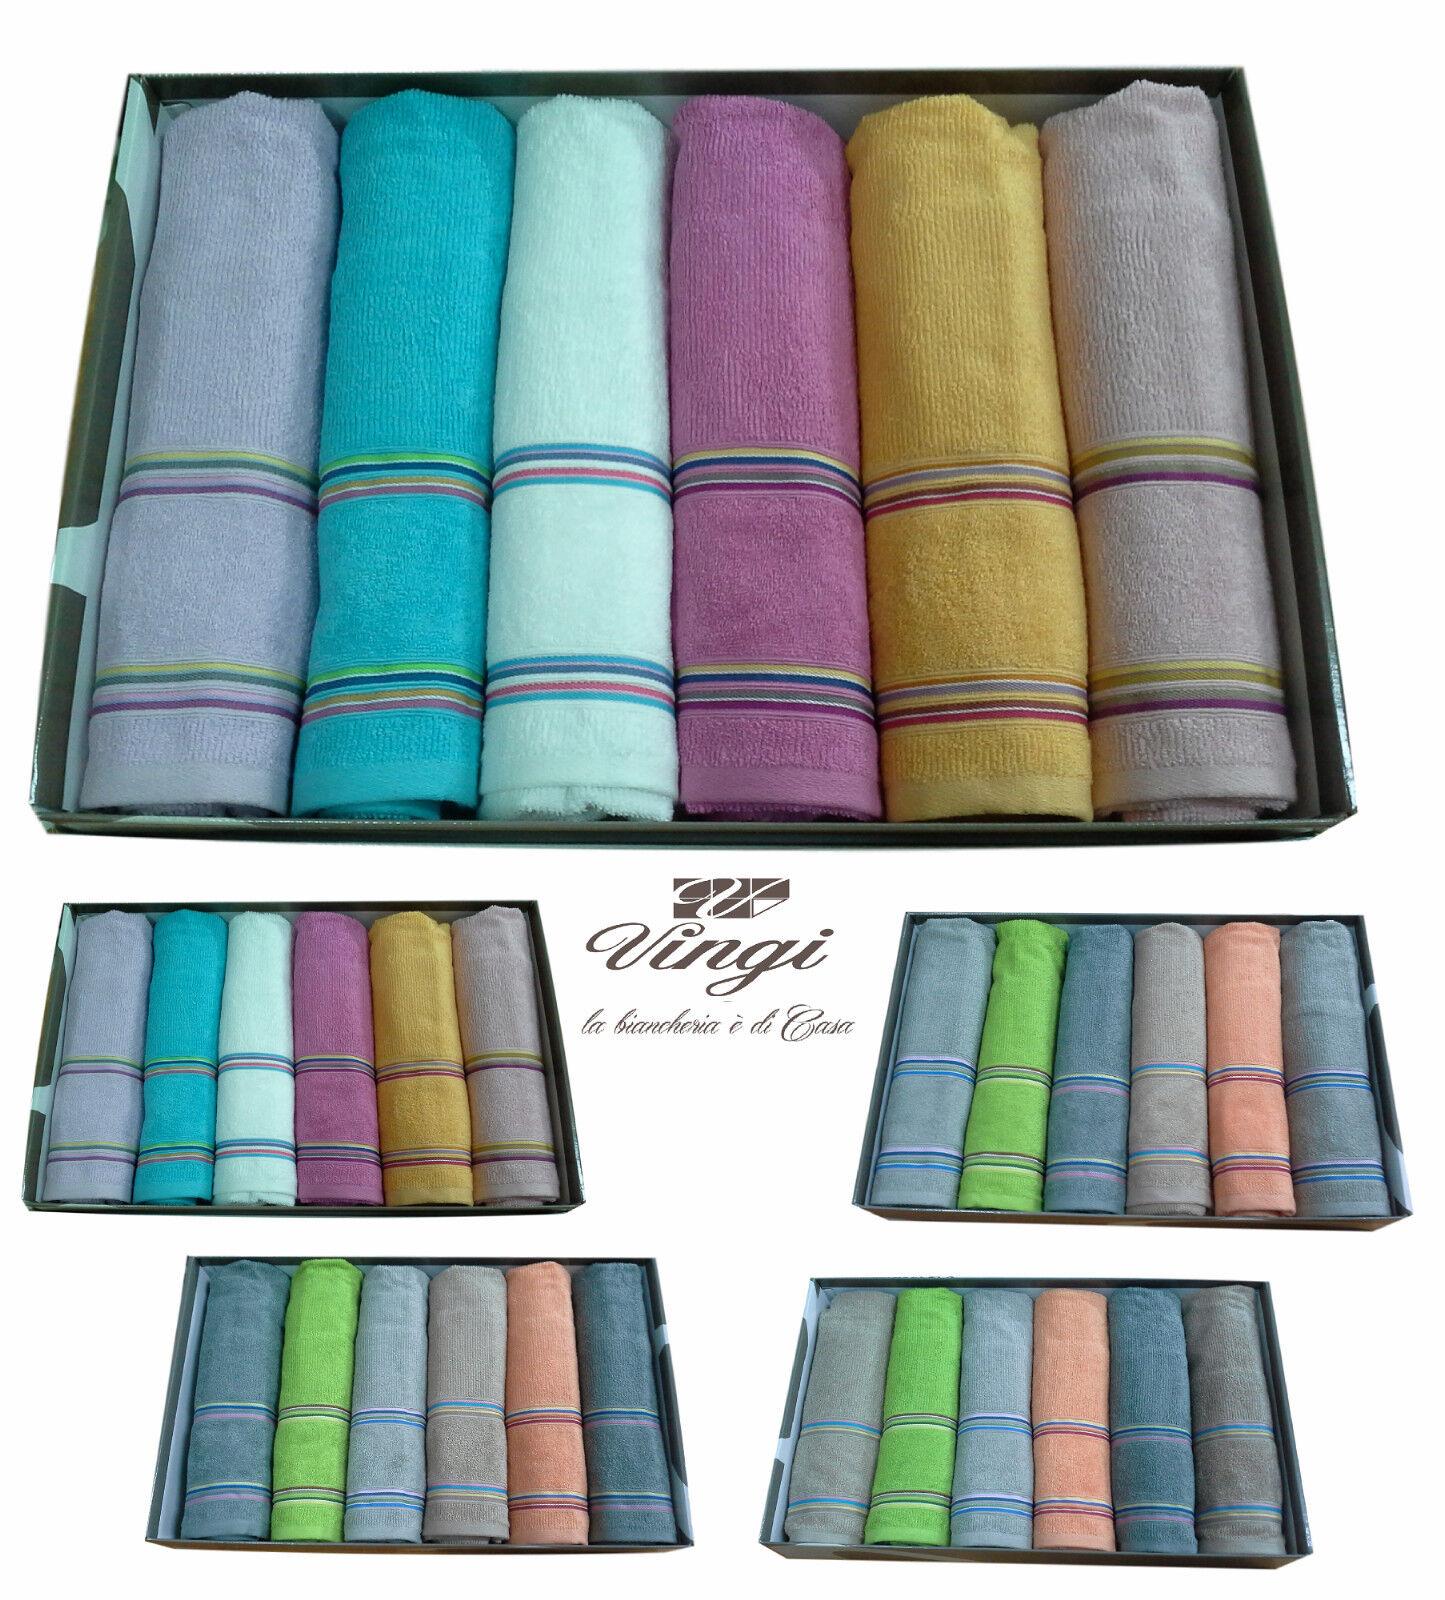 Set asciugamani spugna. VINGI RICAMI, MULTIFarbe. 6 Viso + 6 ospite. 100% Cotone